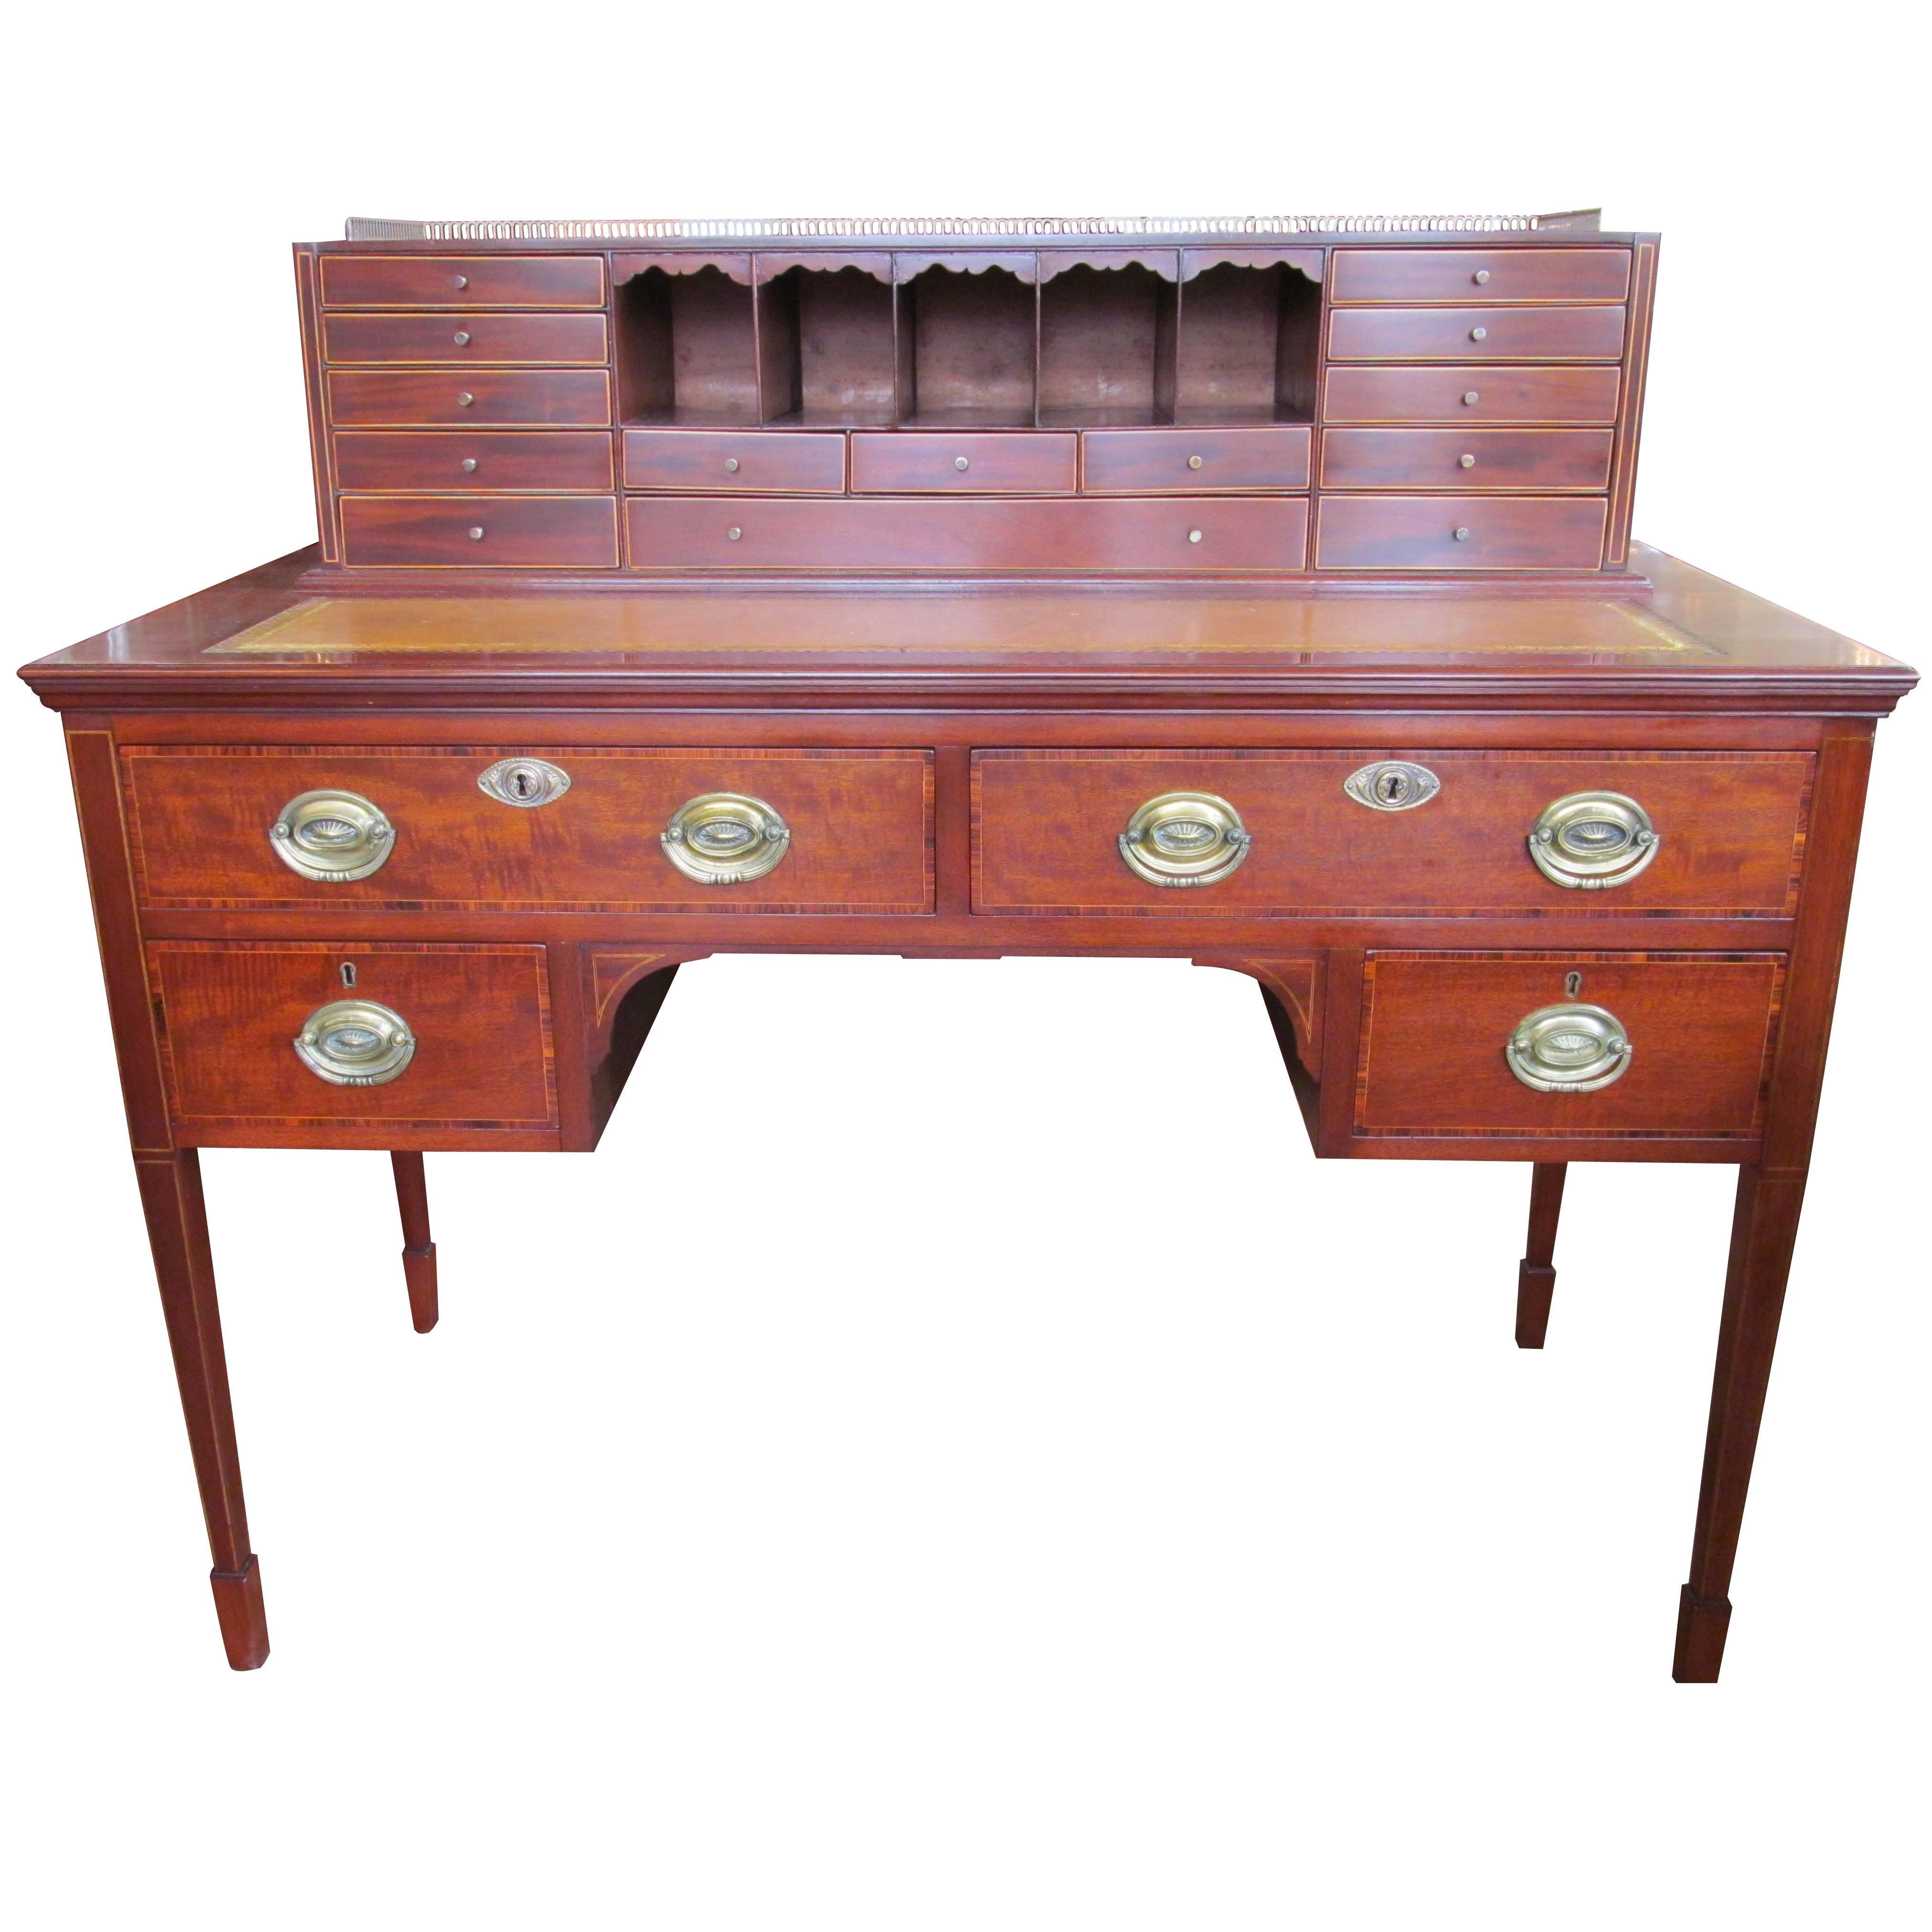 Antique English Mahogany Hepplewhite Style Writing Desk with Original Brasses